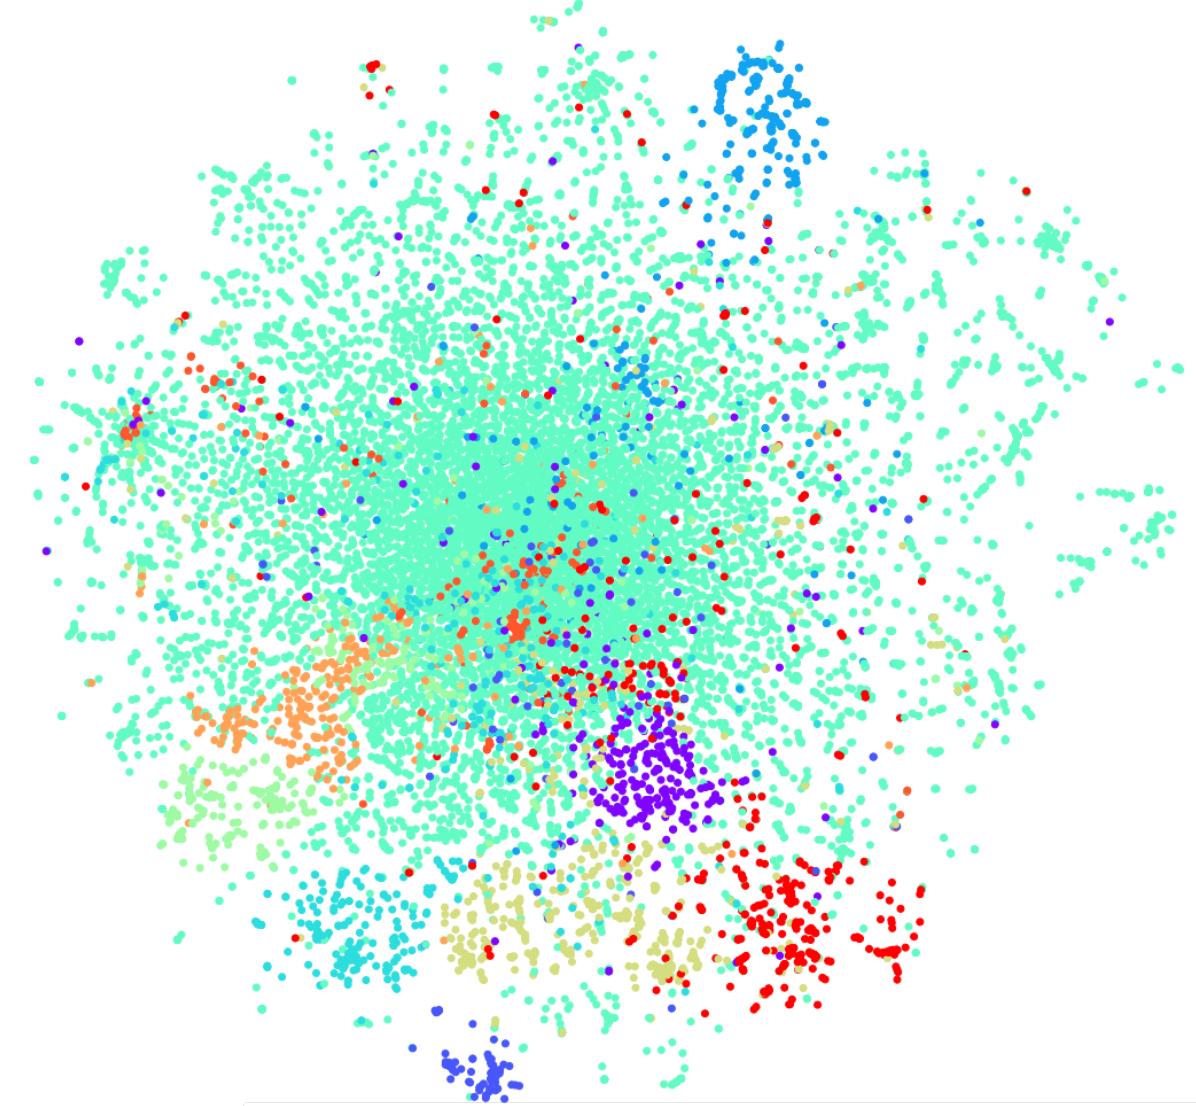 Deep Learning vs common sense: разрабатываем чат-бота - 3